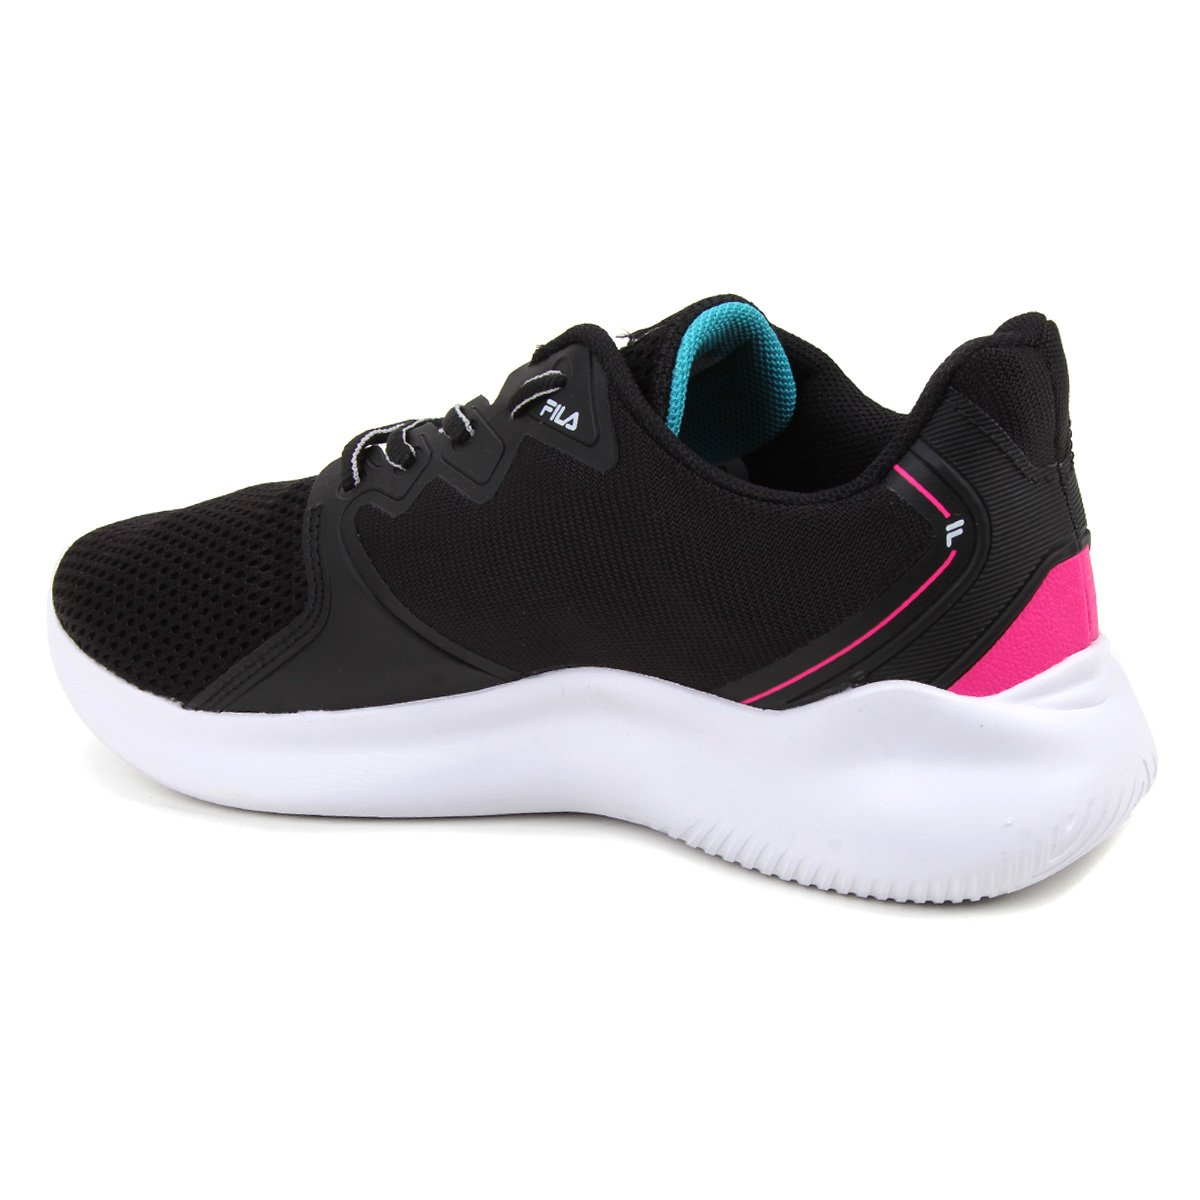 Tenis Fila Preto/Pink Feminino Sparky